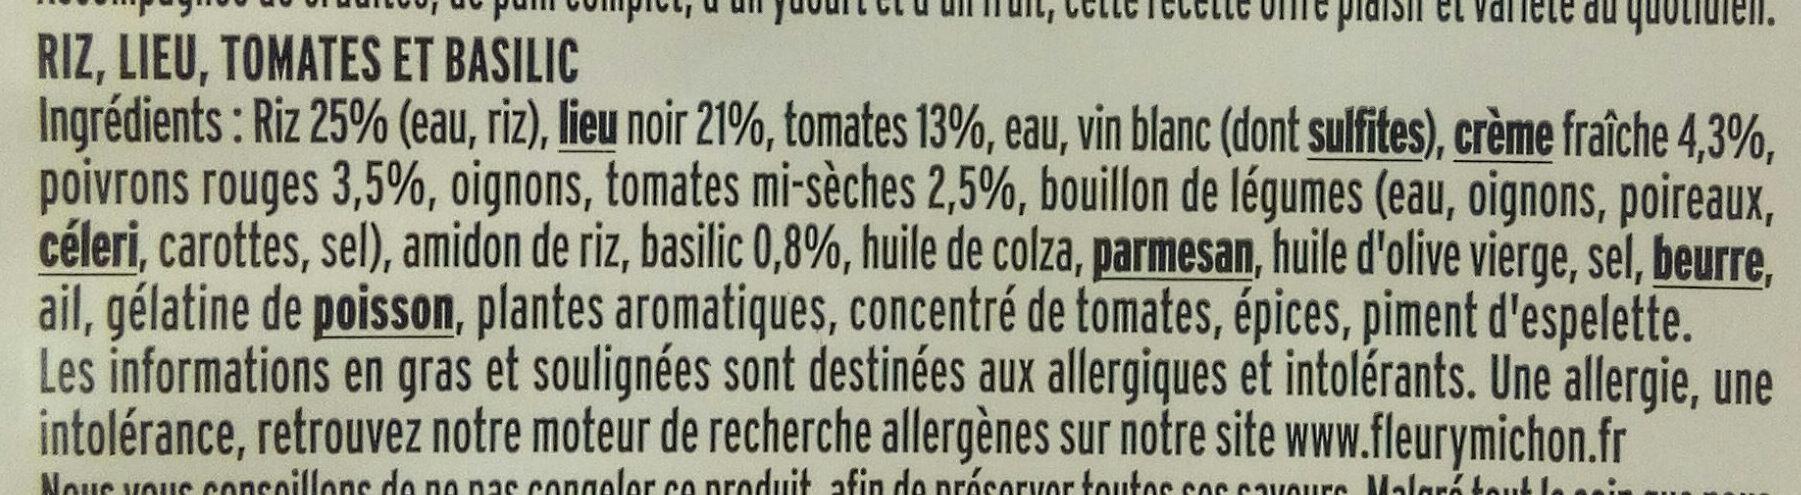 Filet de lieu Risotto Tomates Basilic - Ingredients